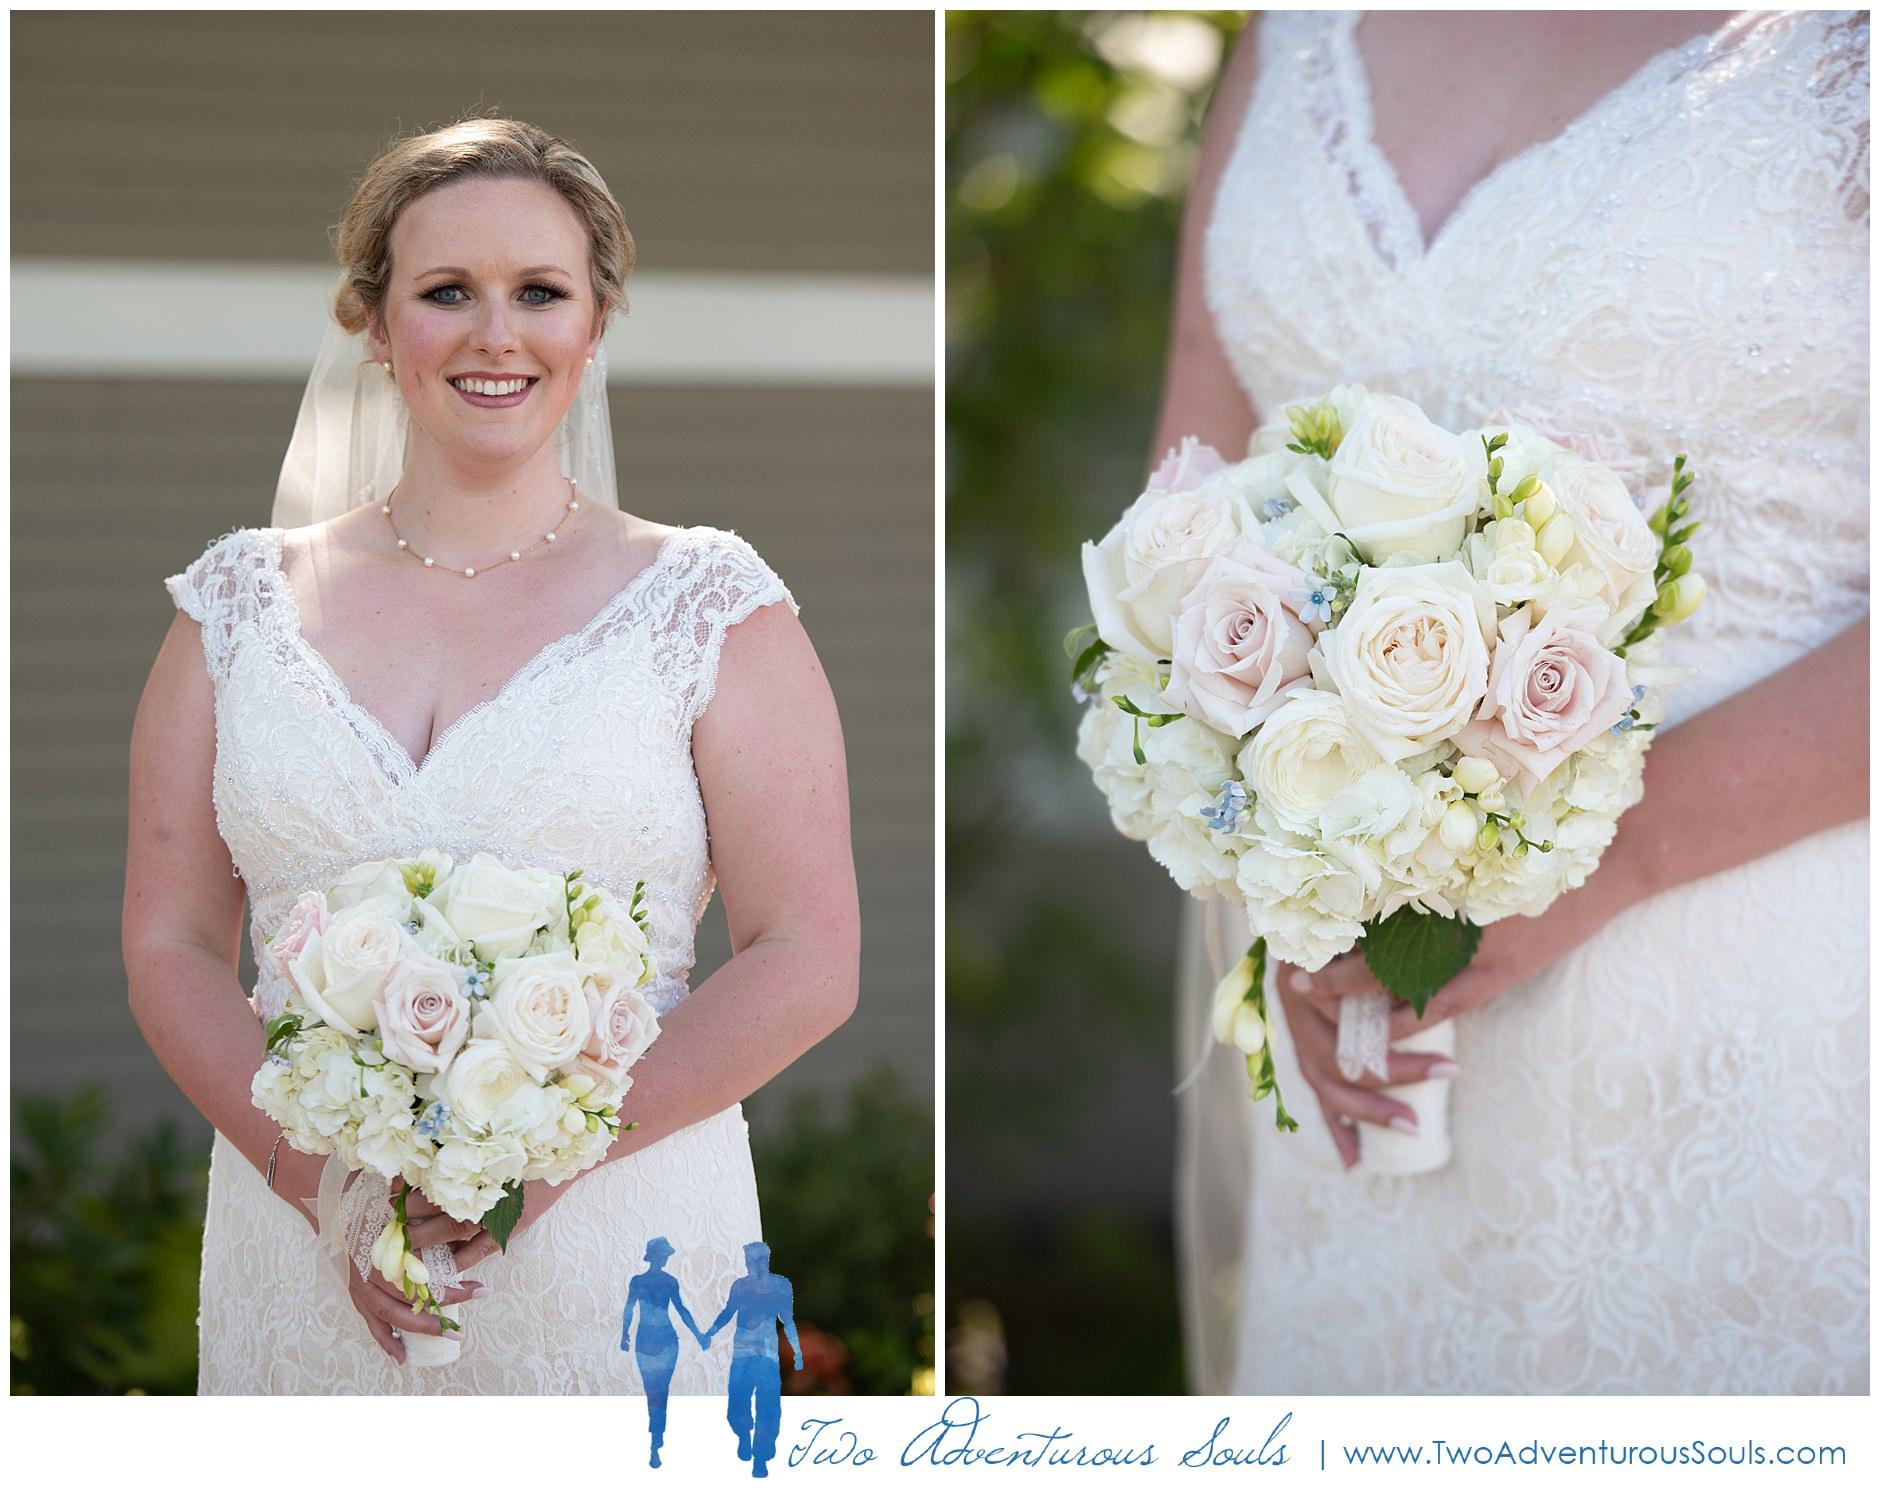 Cape Cod Wedding Photographers, Destination Wedding Photographers, Two Adventurous Souls-081019_0032.jpg